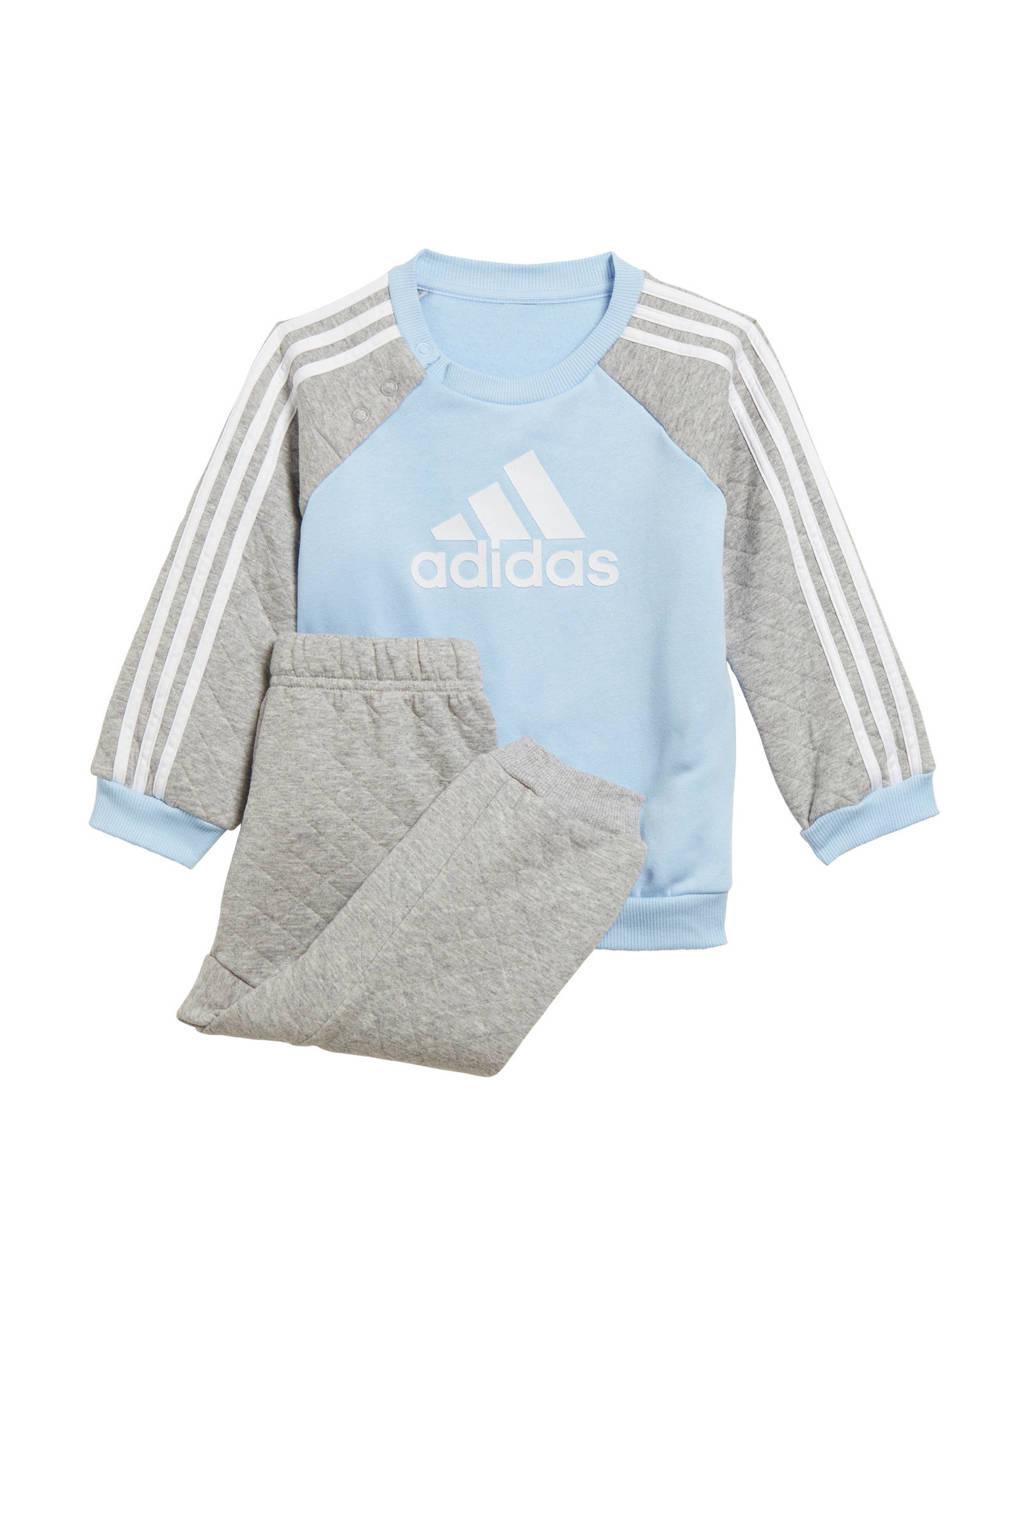 adidas performance   fleece joggingpak lichtblauw/grijs, Lichtblauw/grijs melange/wit